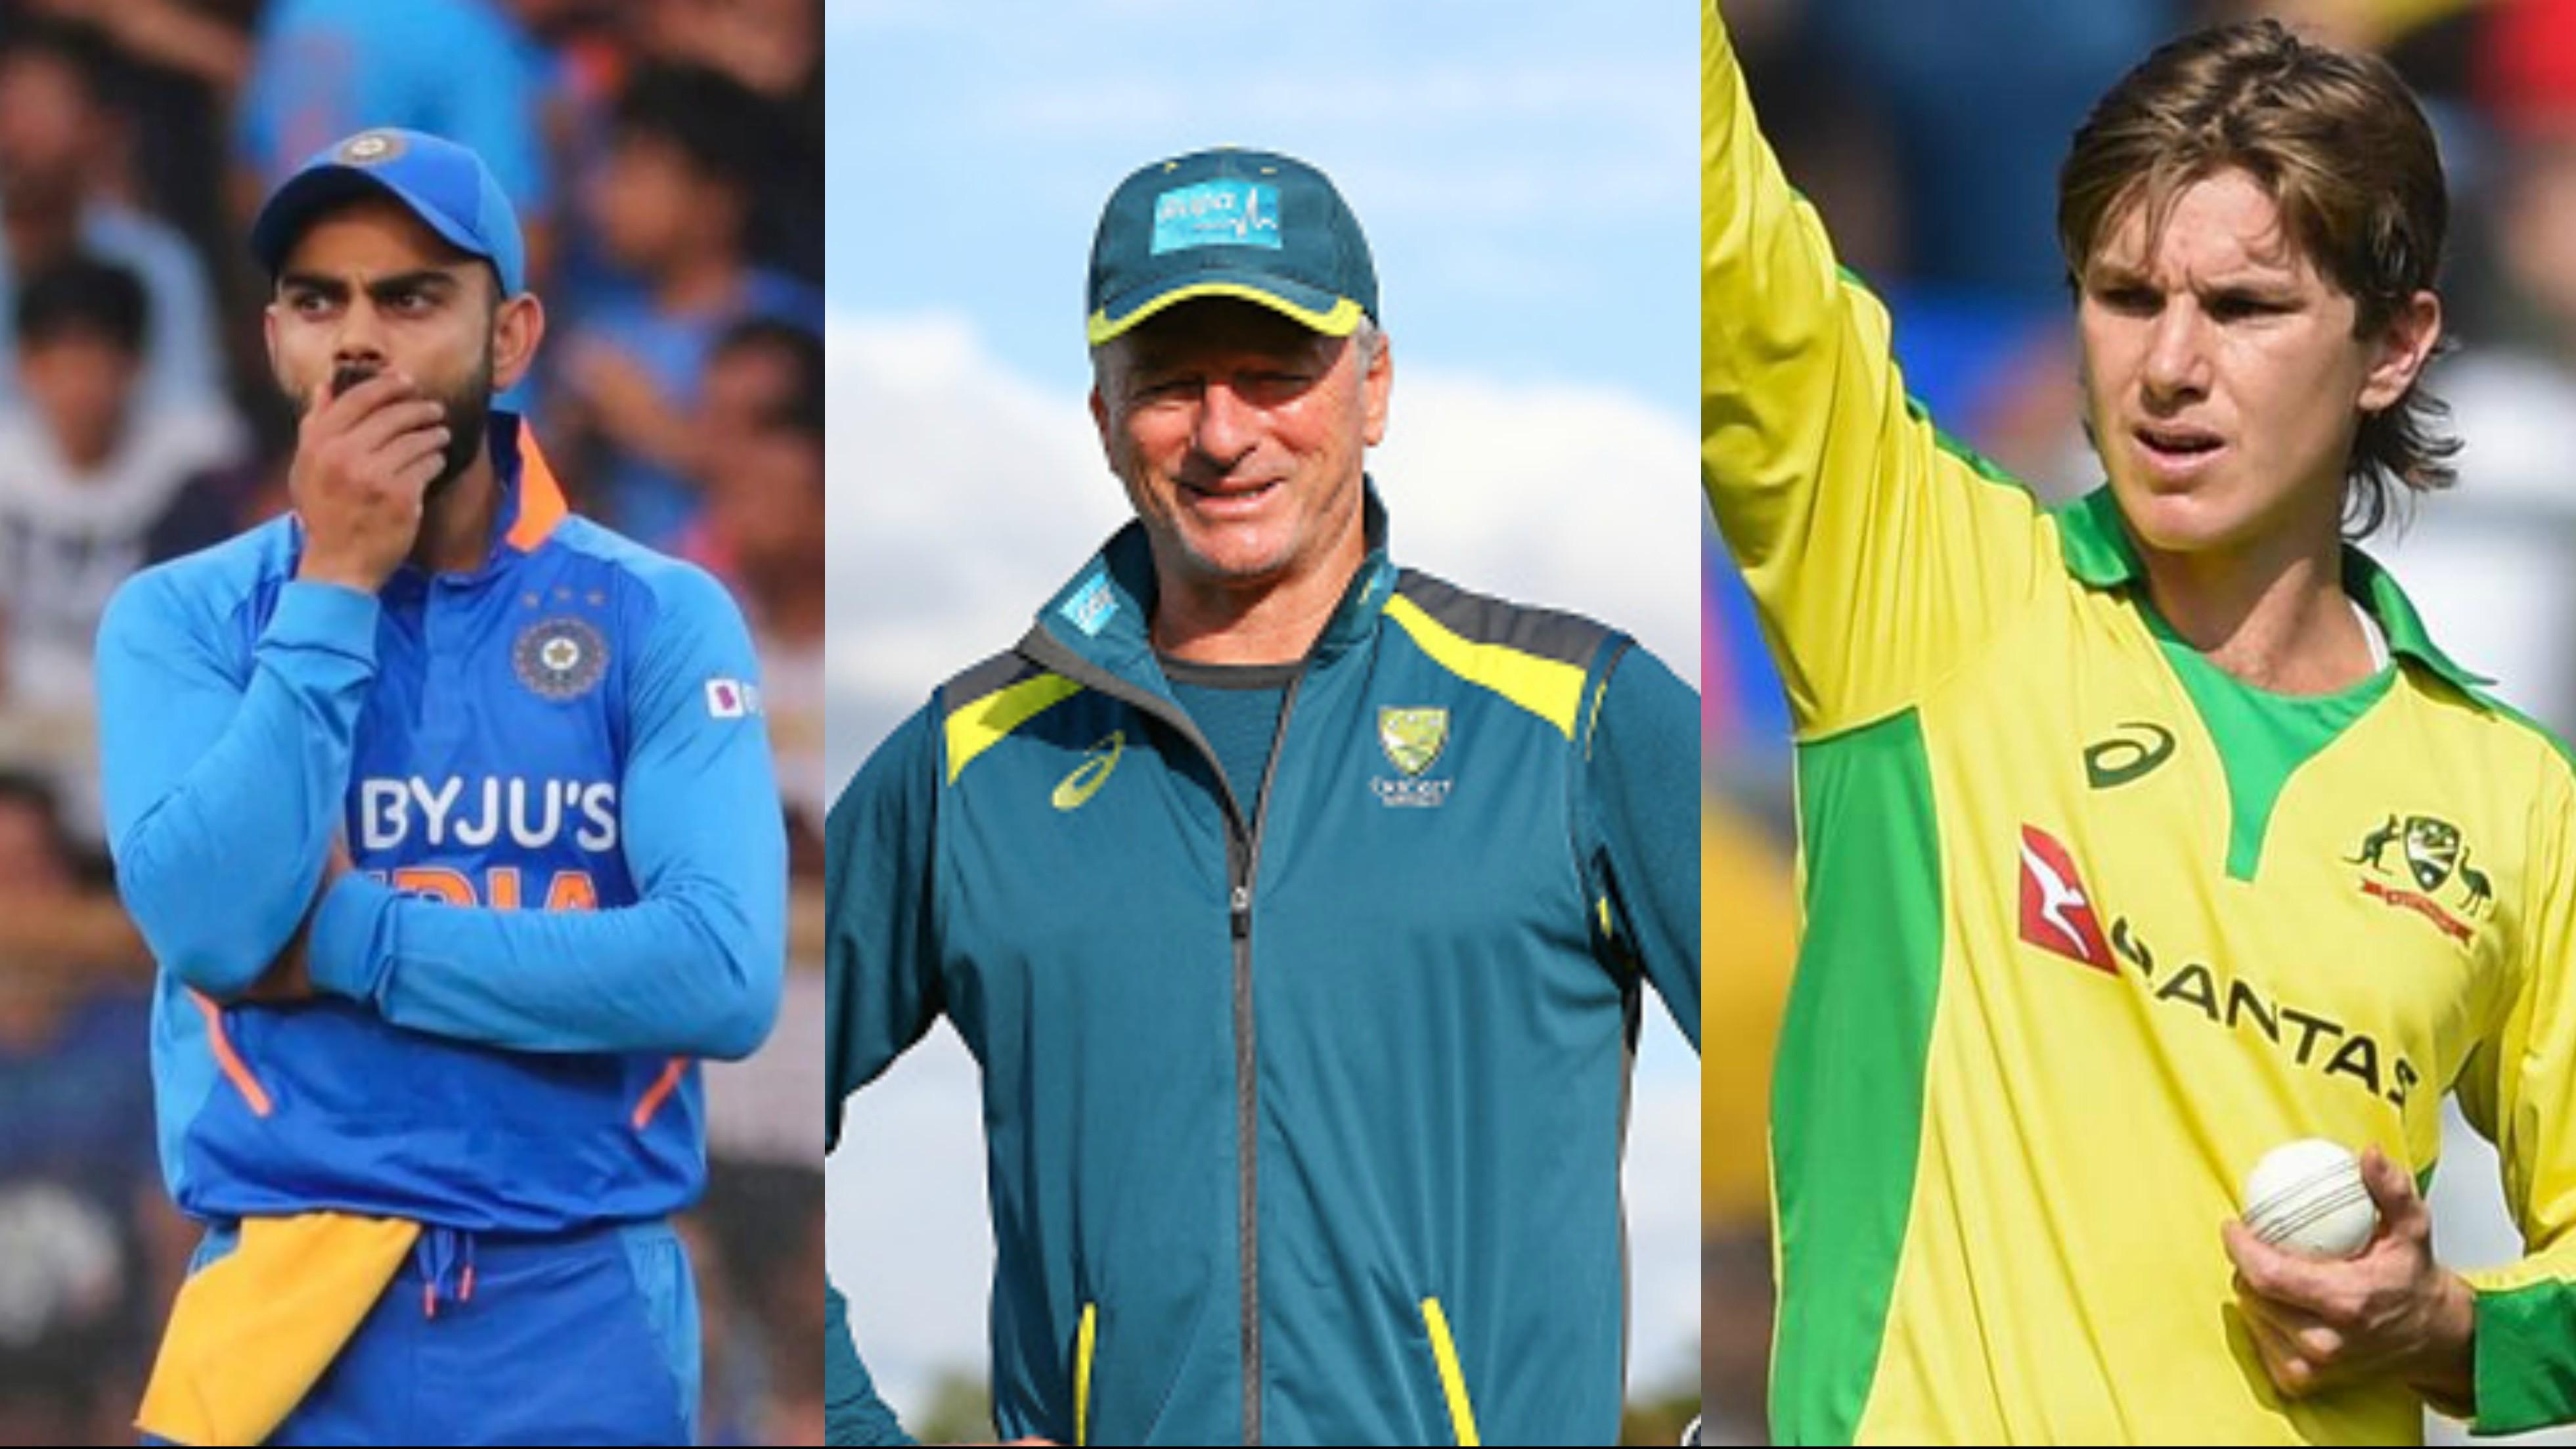 IND v AUS 2020: Virat Kohli paid the price for disrespecting Zampa in Mumbai ODI, says Steve Waugh